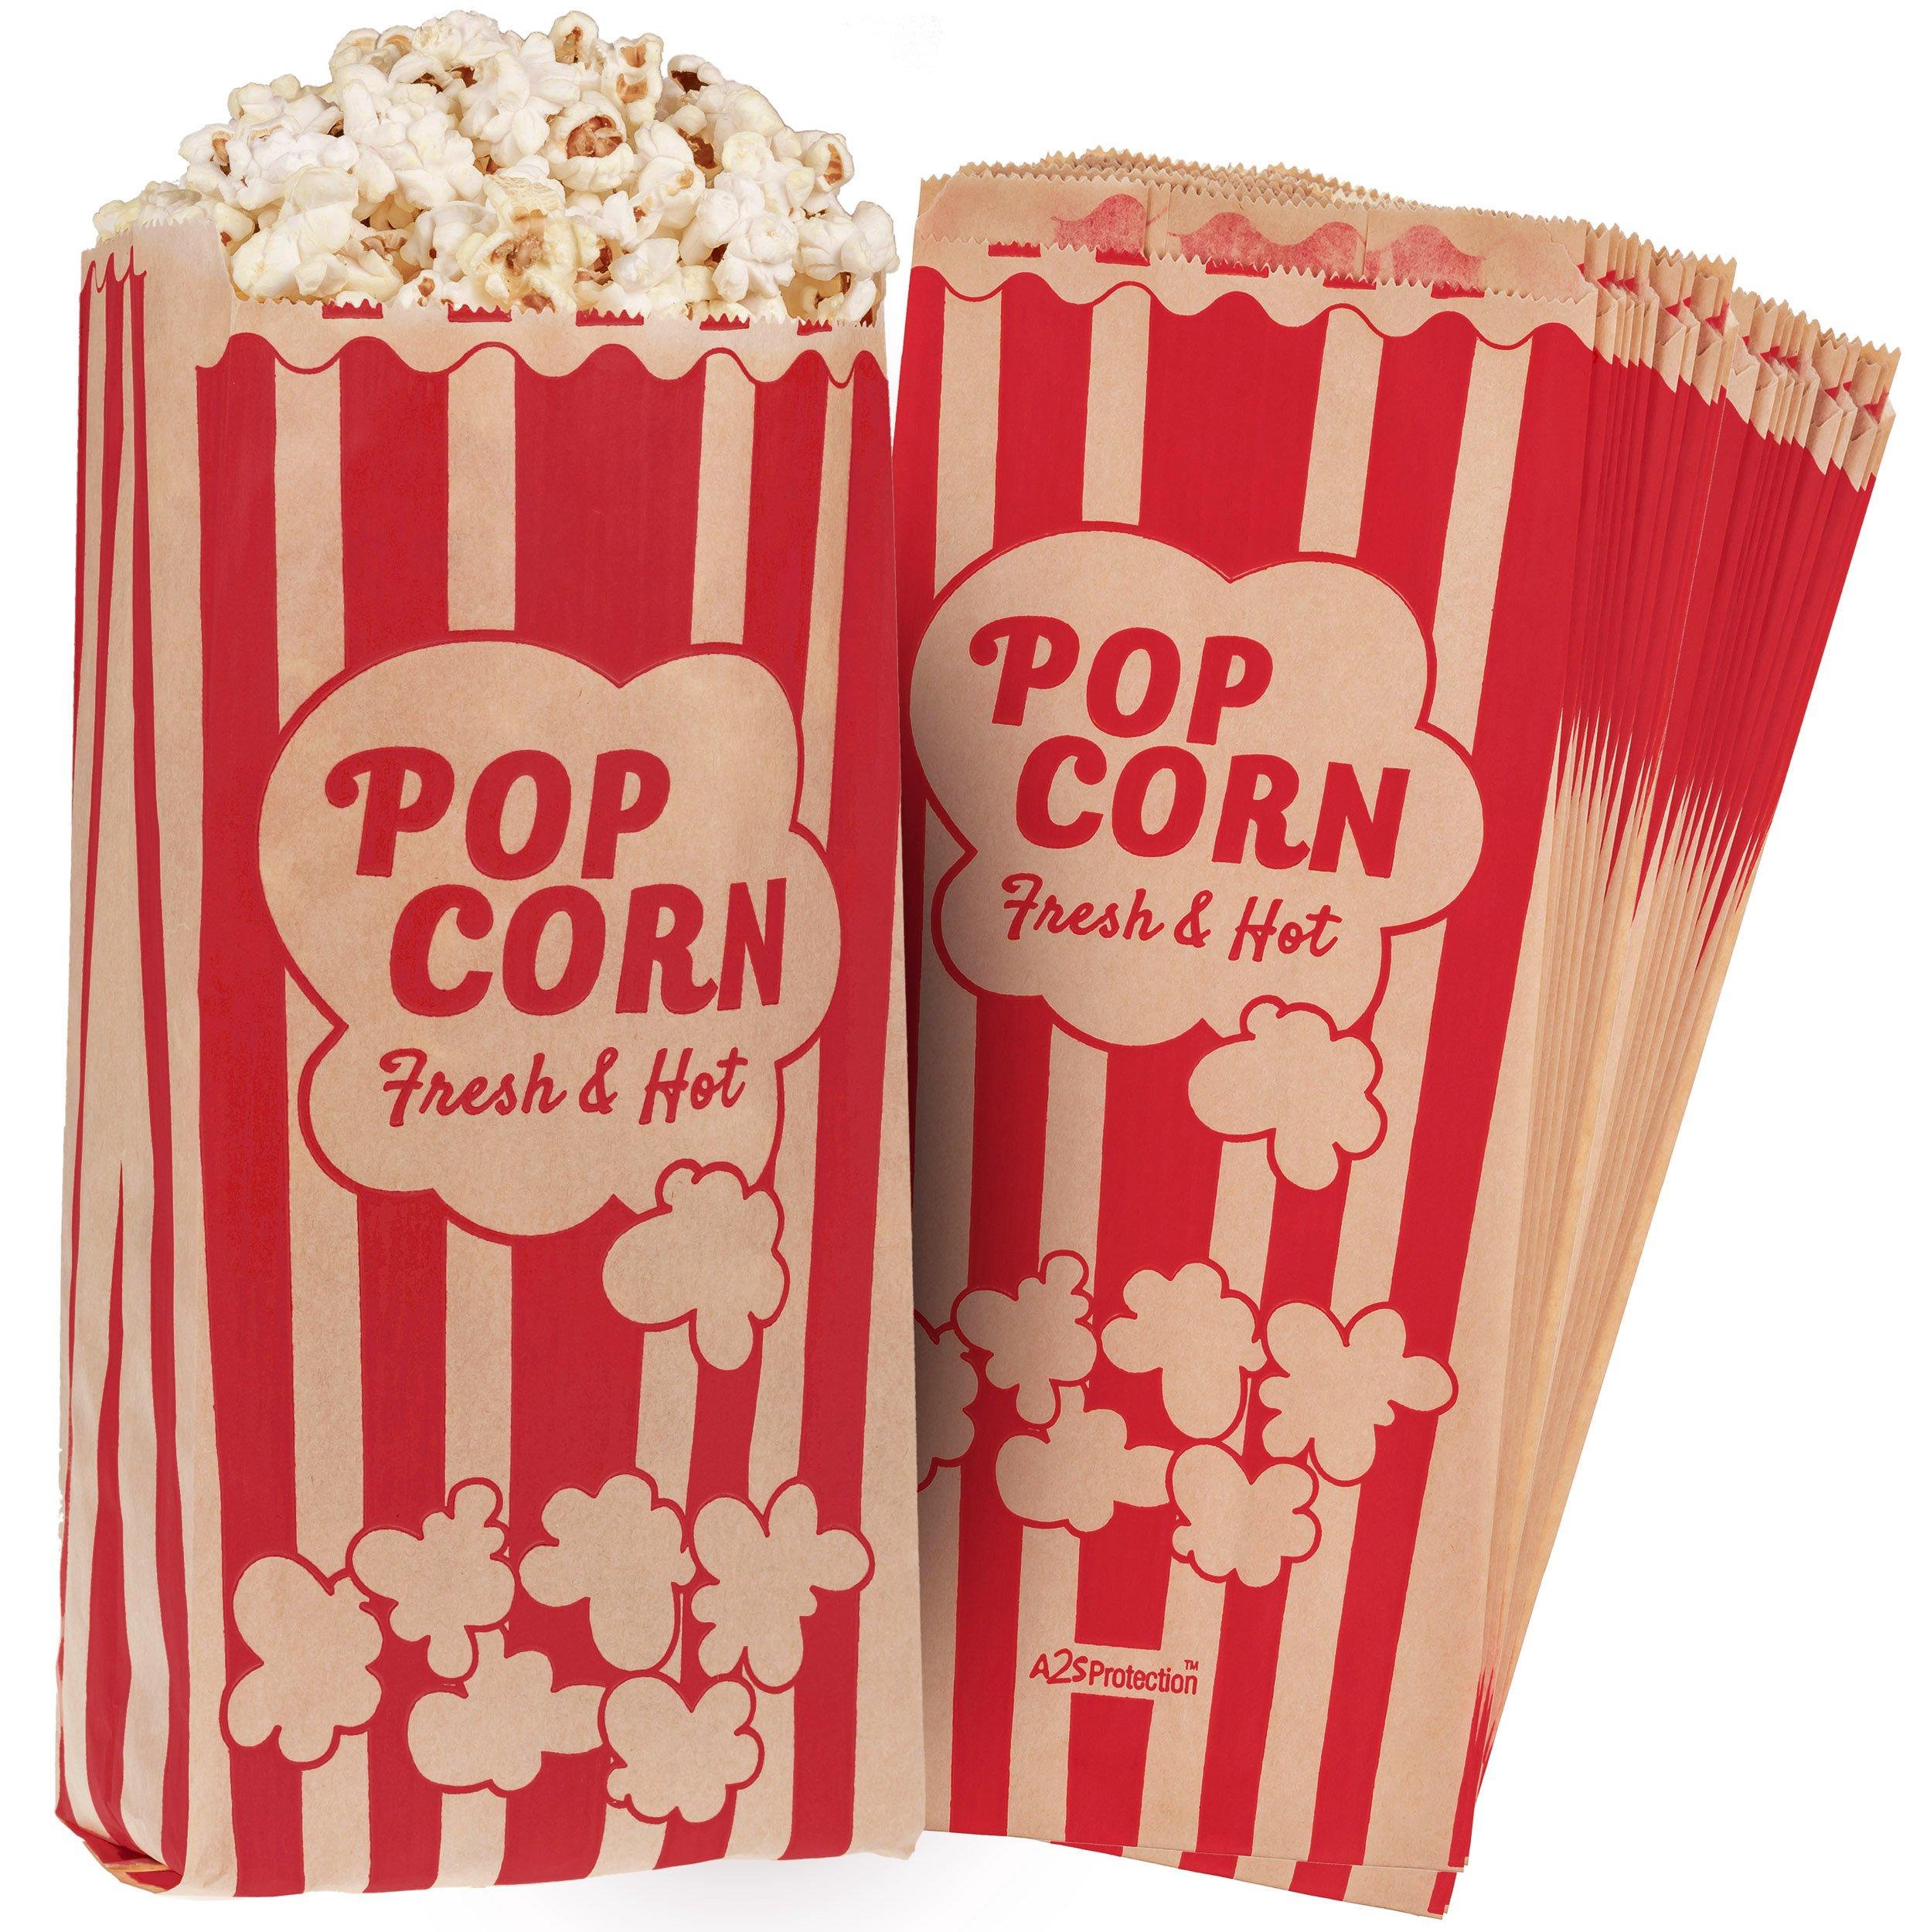 "Popcorn Bags Kraft Paper Red Printed Vintage Retro Style 125 Pcs Large 11"" X 5"" X 3"" - Coated - Oil/Grease Proof - Prevent Salt Popcorn Seasoning Popcorn Kernels & Pop Corn Oil to Drop"